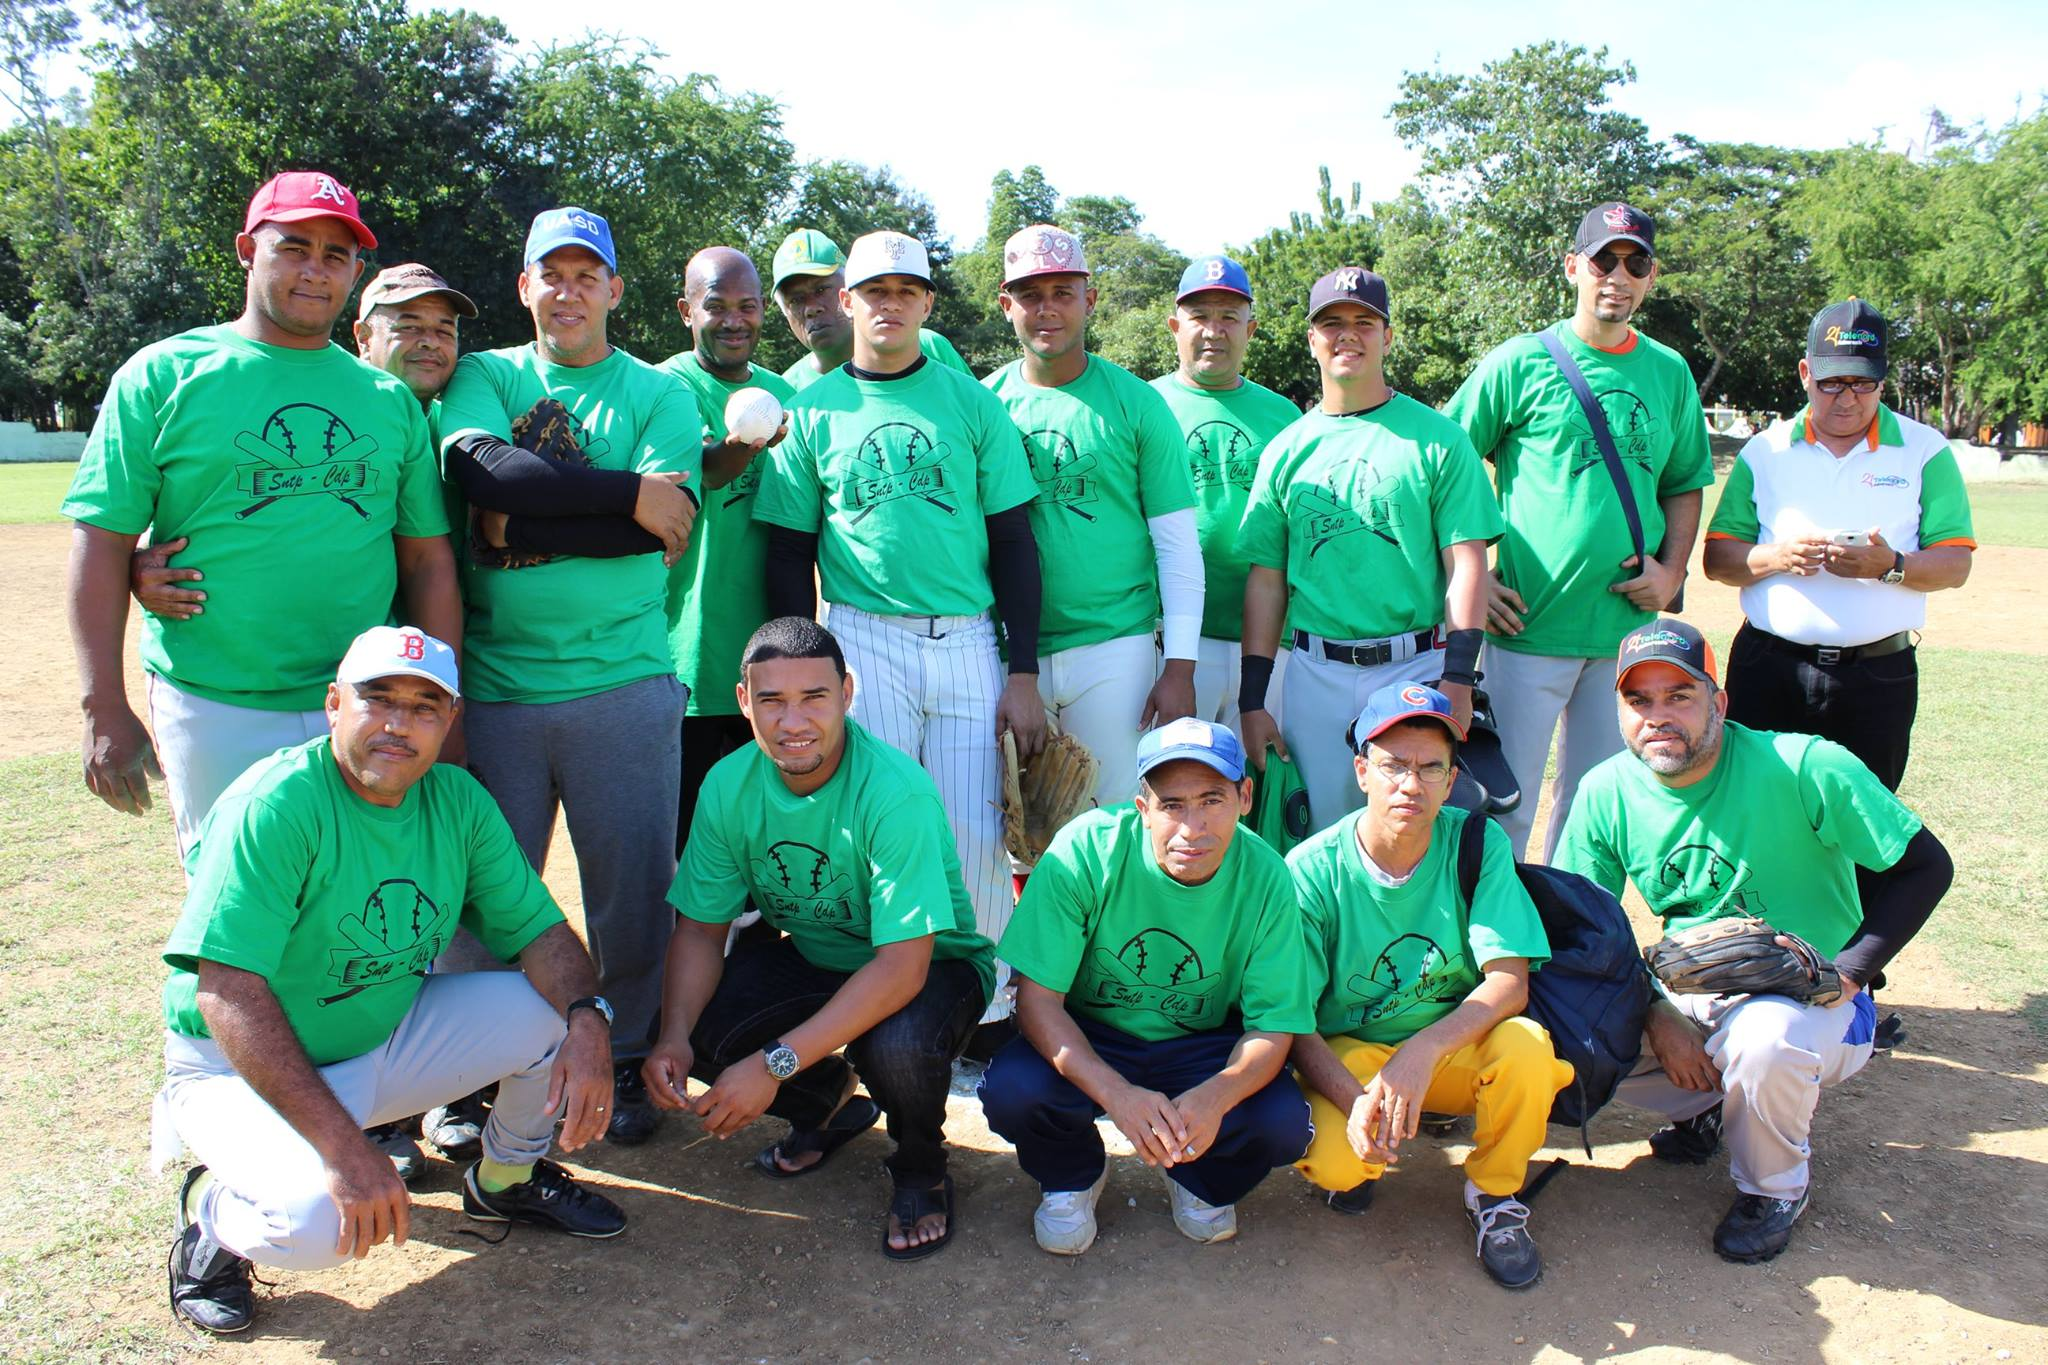 Inician torneo de softbol chata entre comunicadores